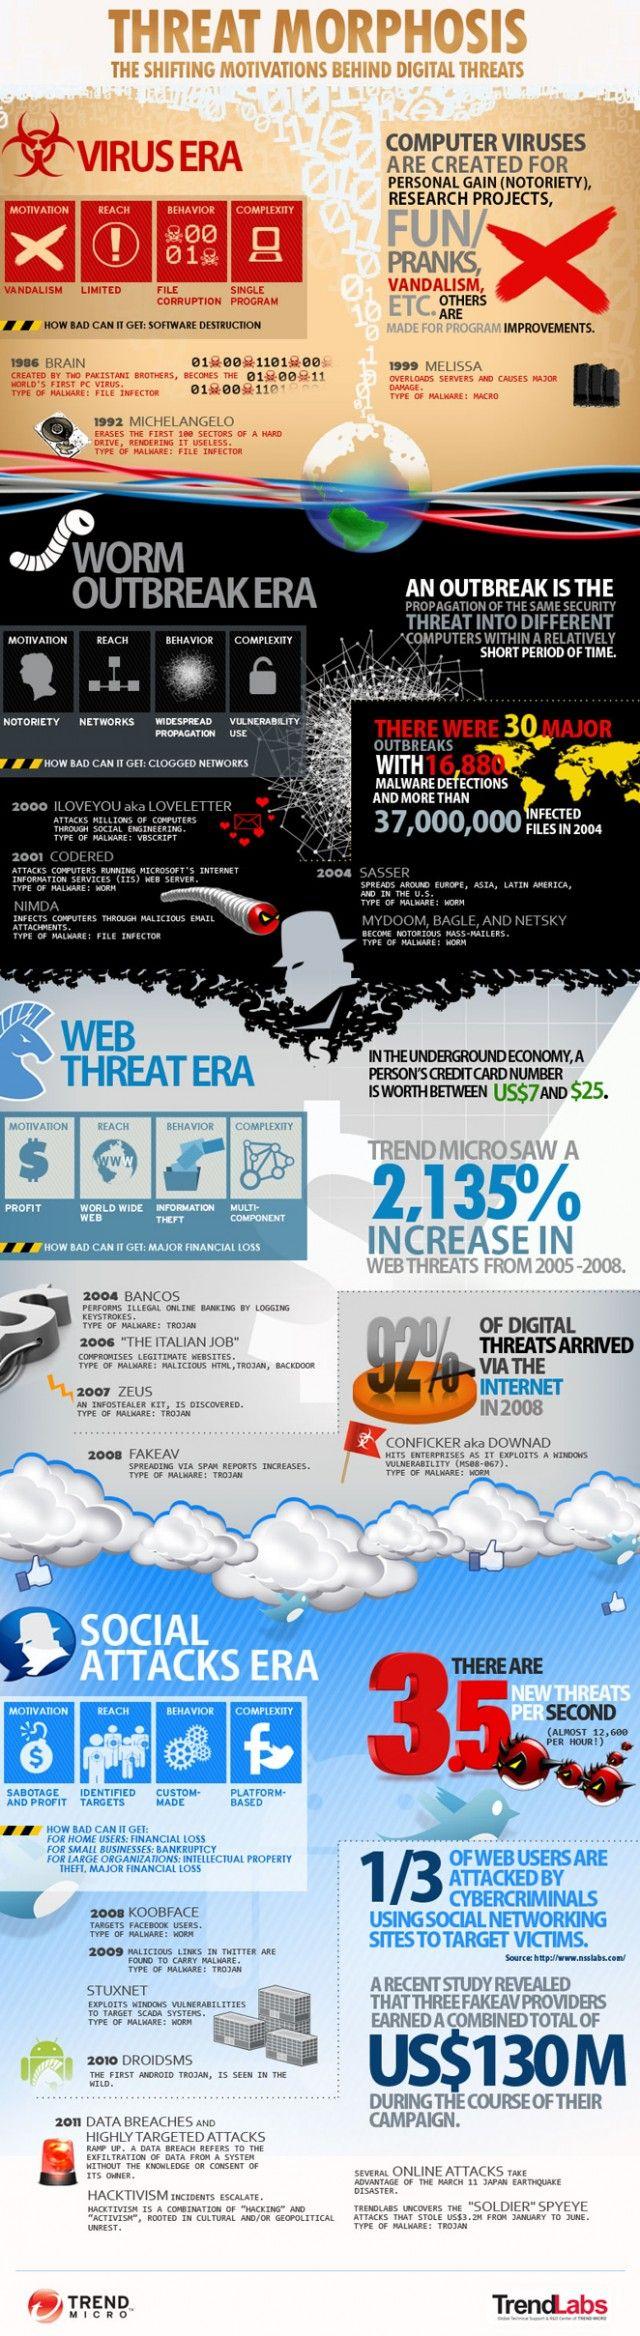 Threat Morphosis: Evolution of